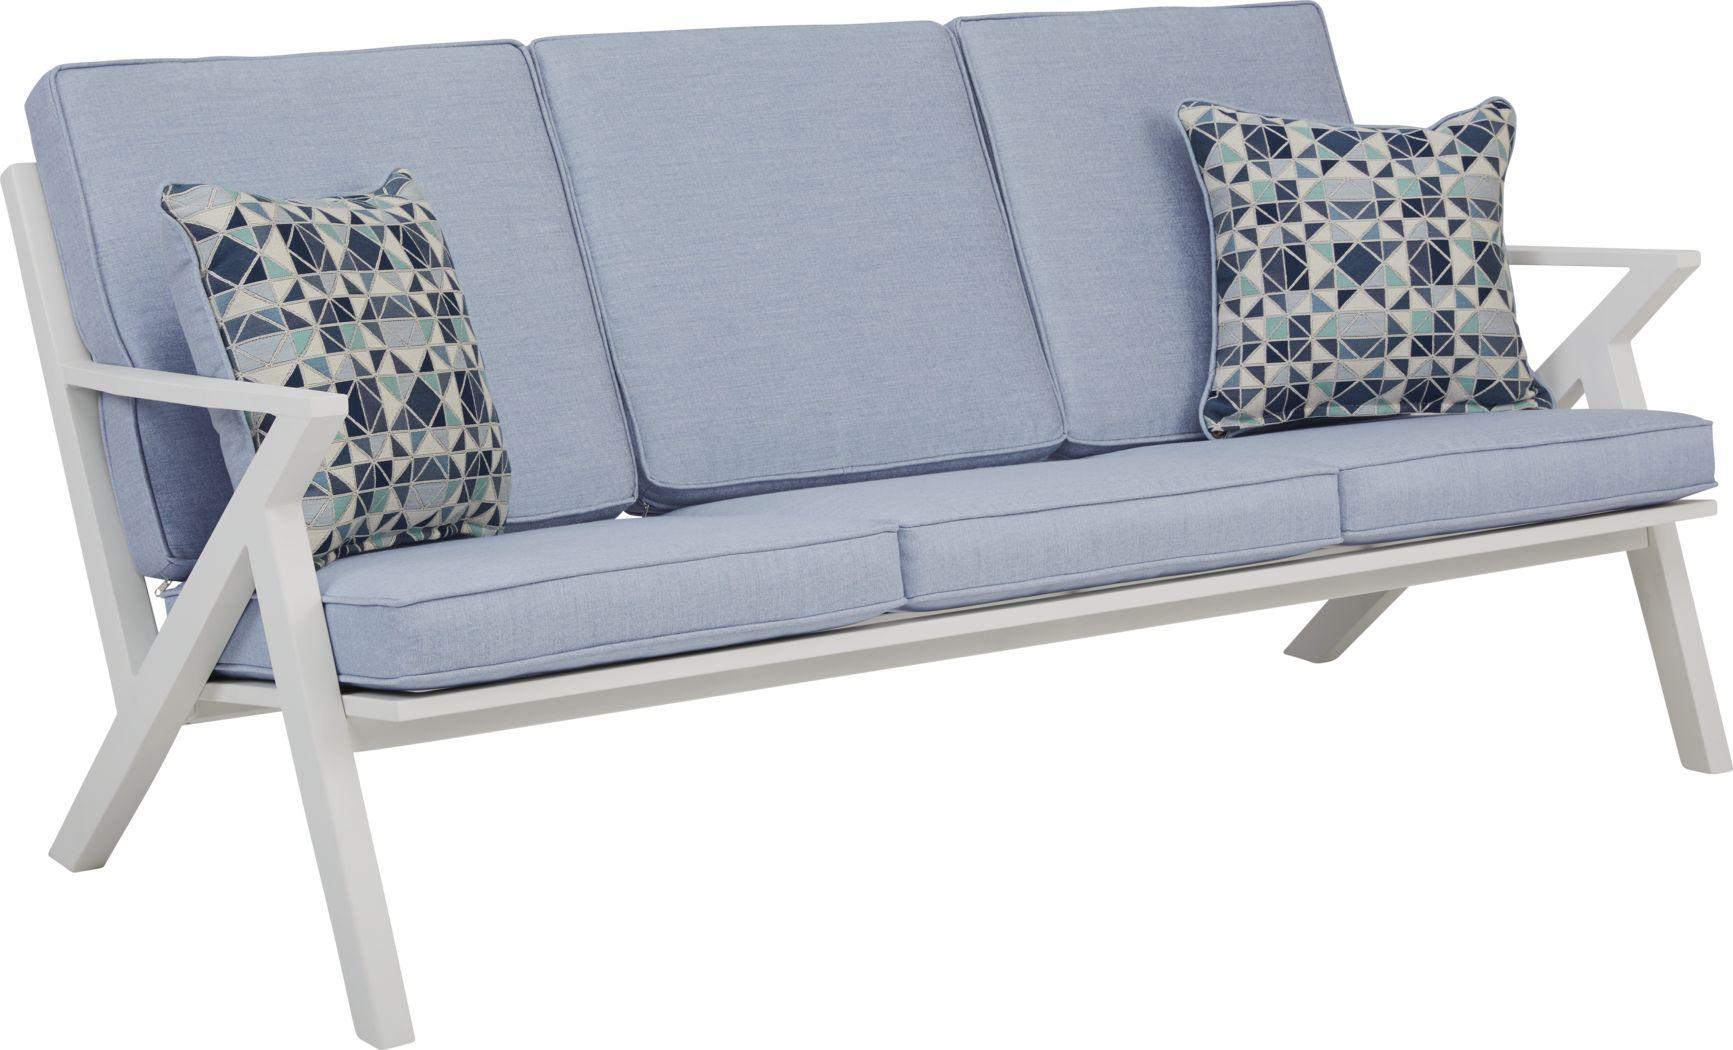 Acadia White Outdoor Sofa with Hydra Cushions